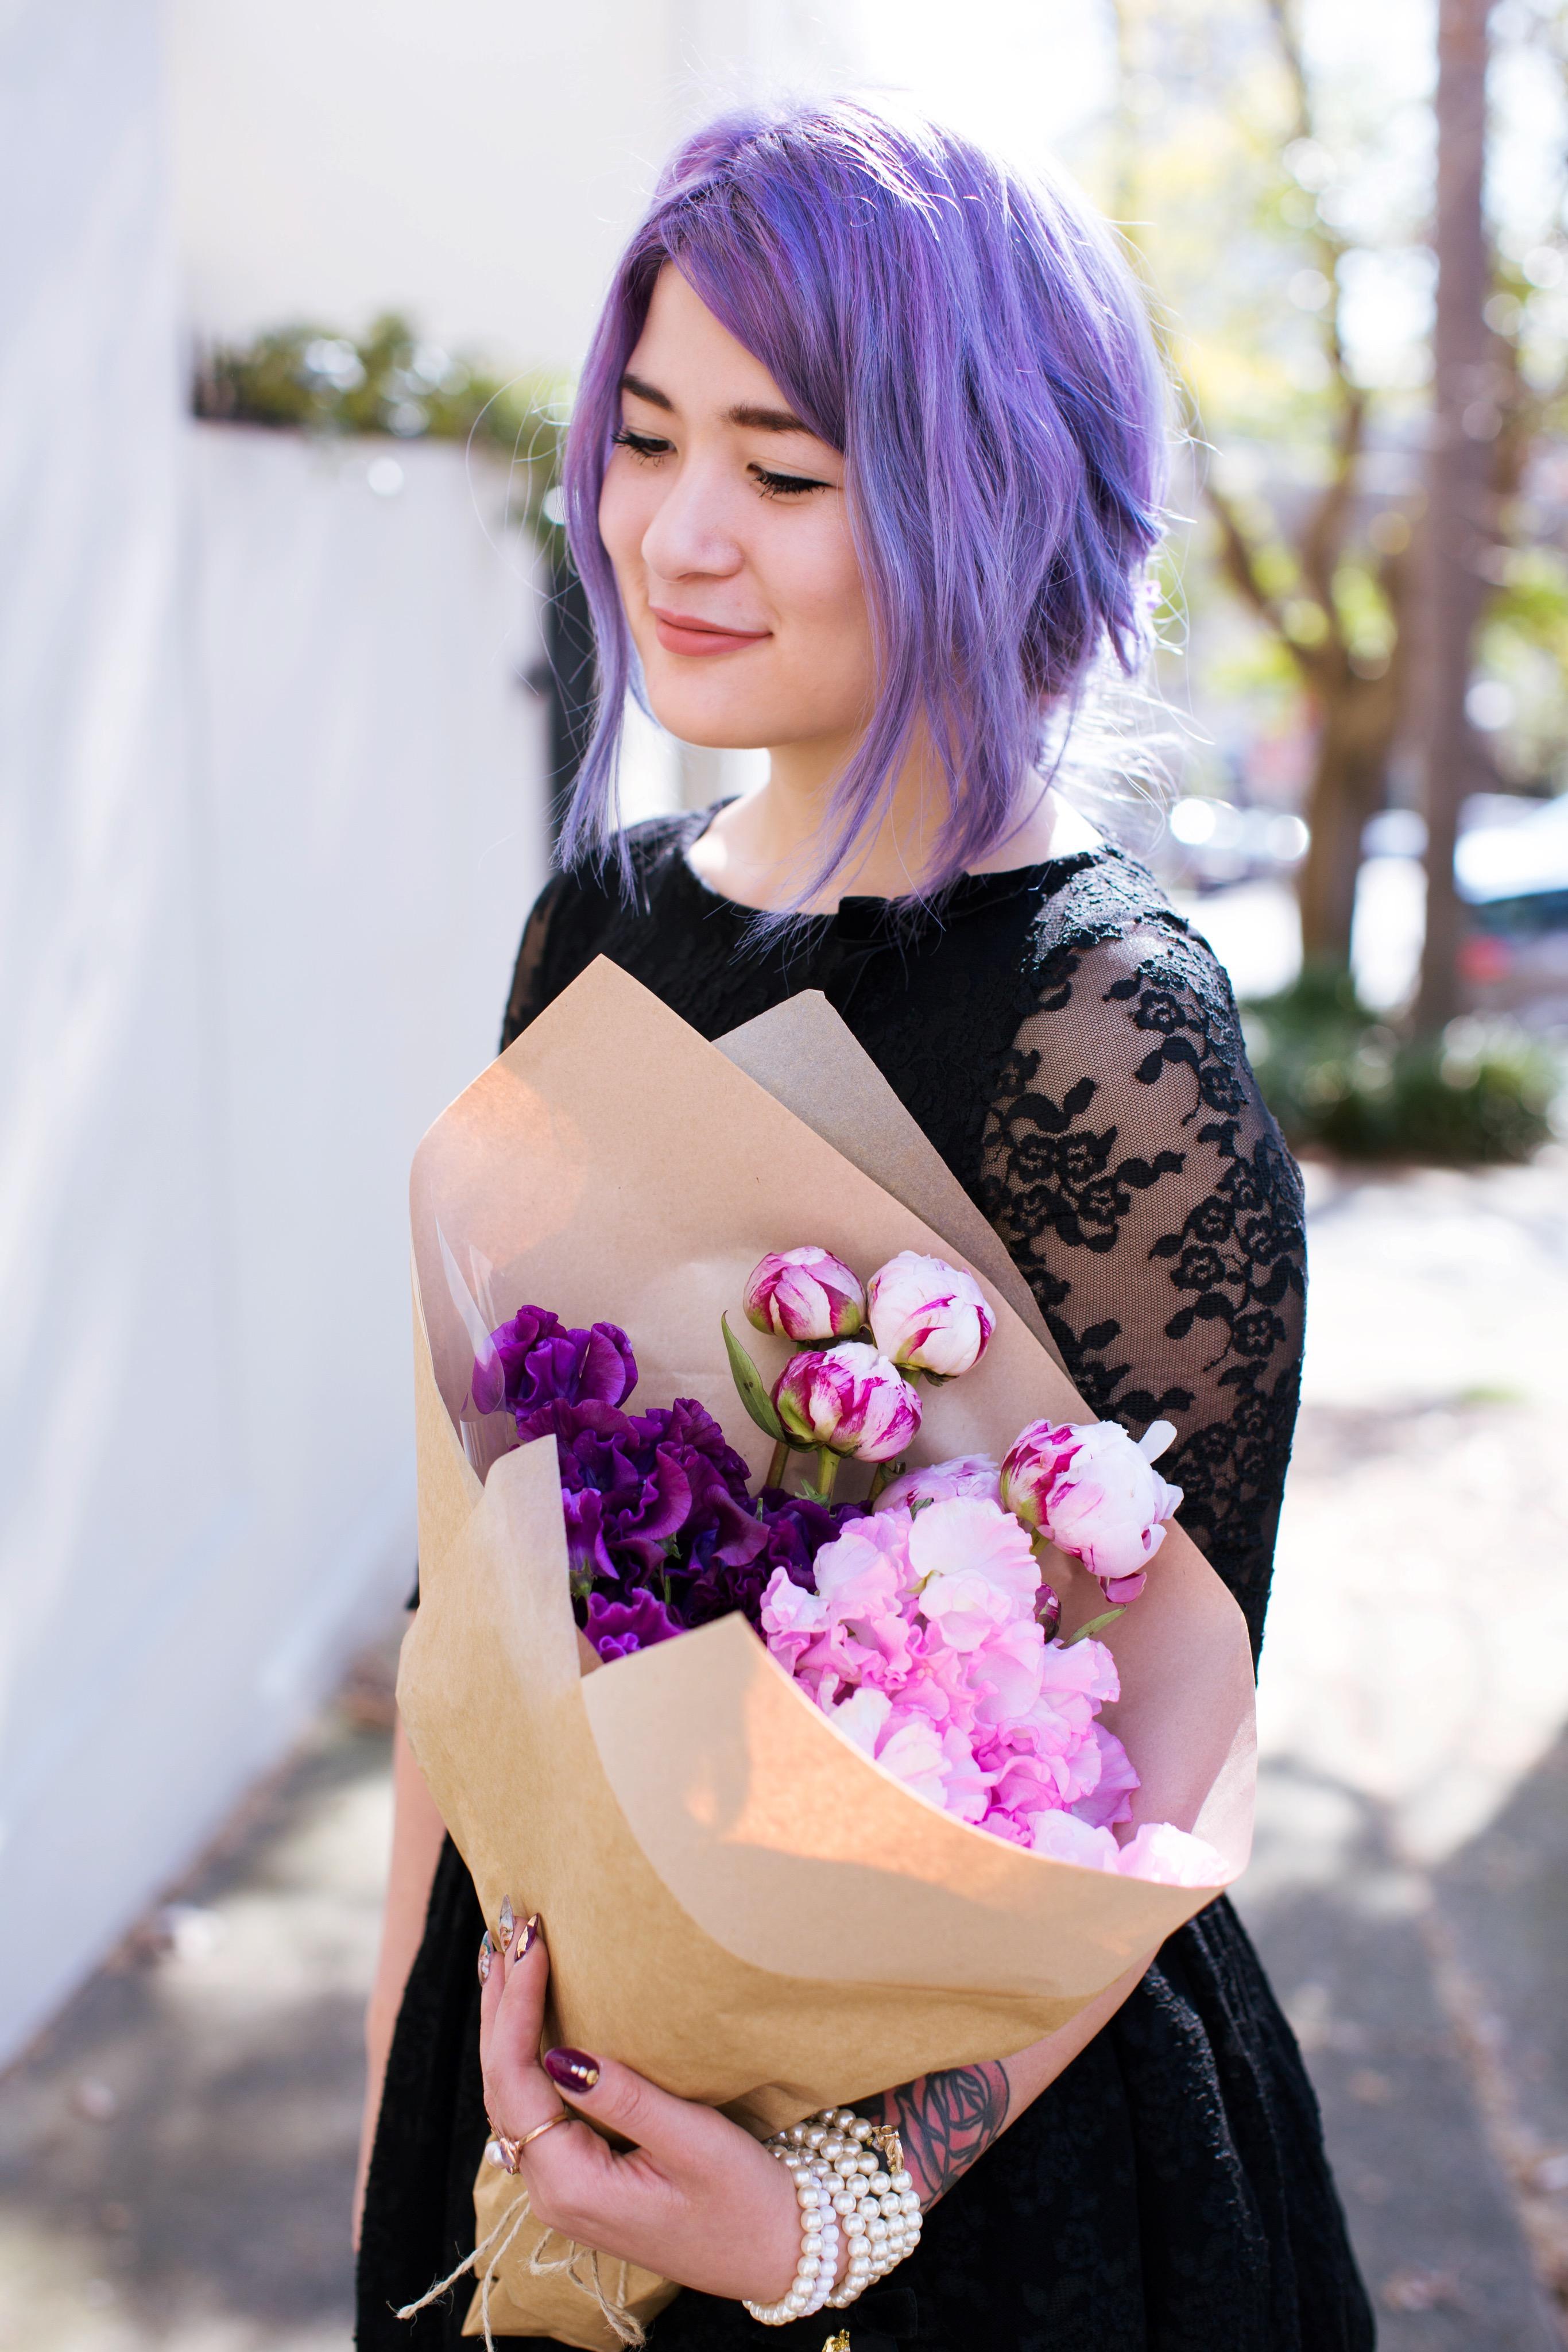 emi unicorn wheels & dollbaby black lace dress